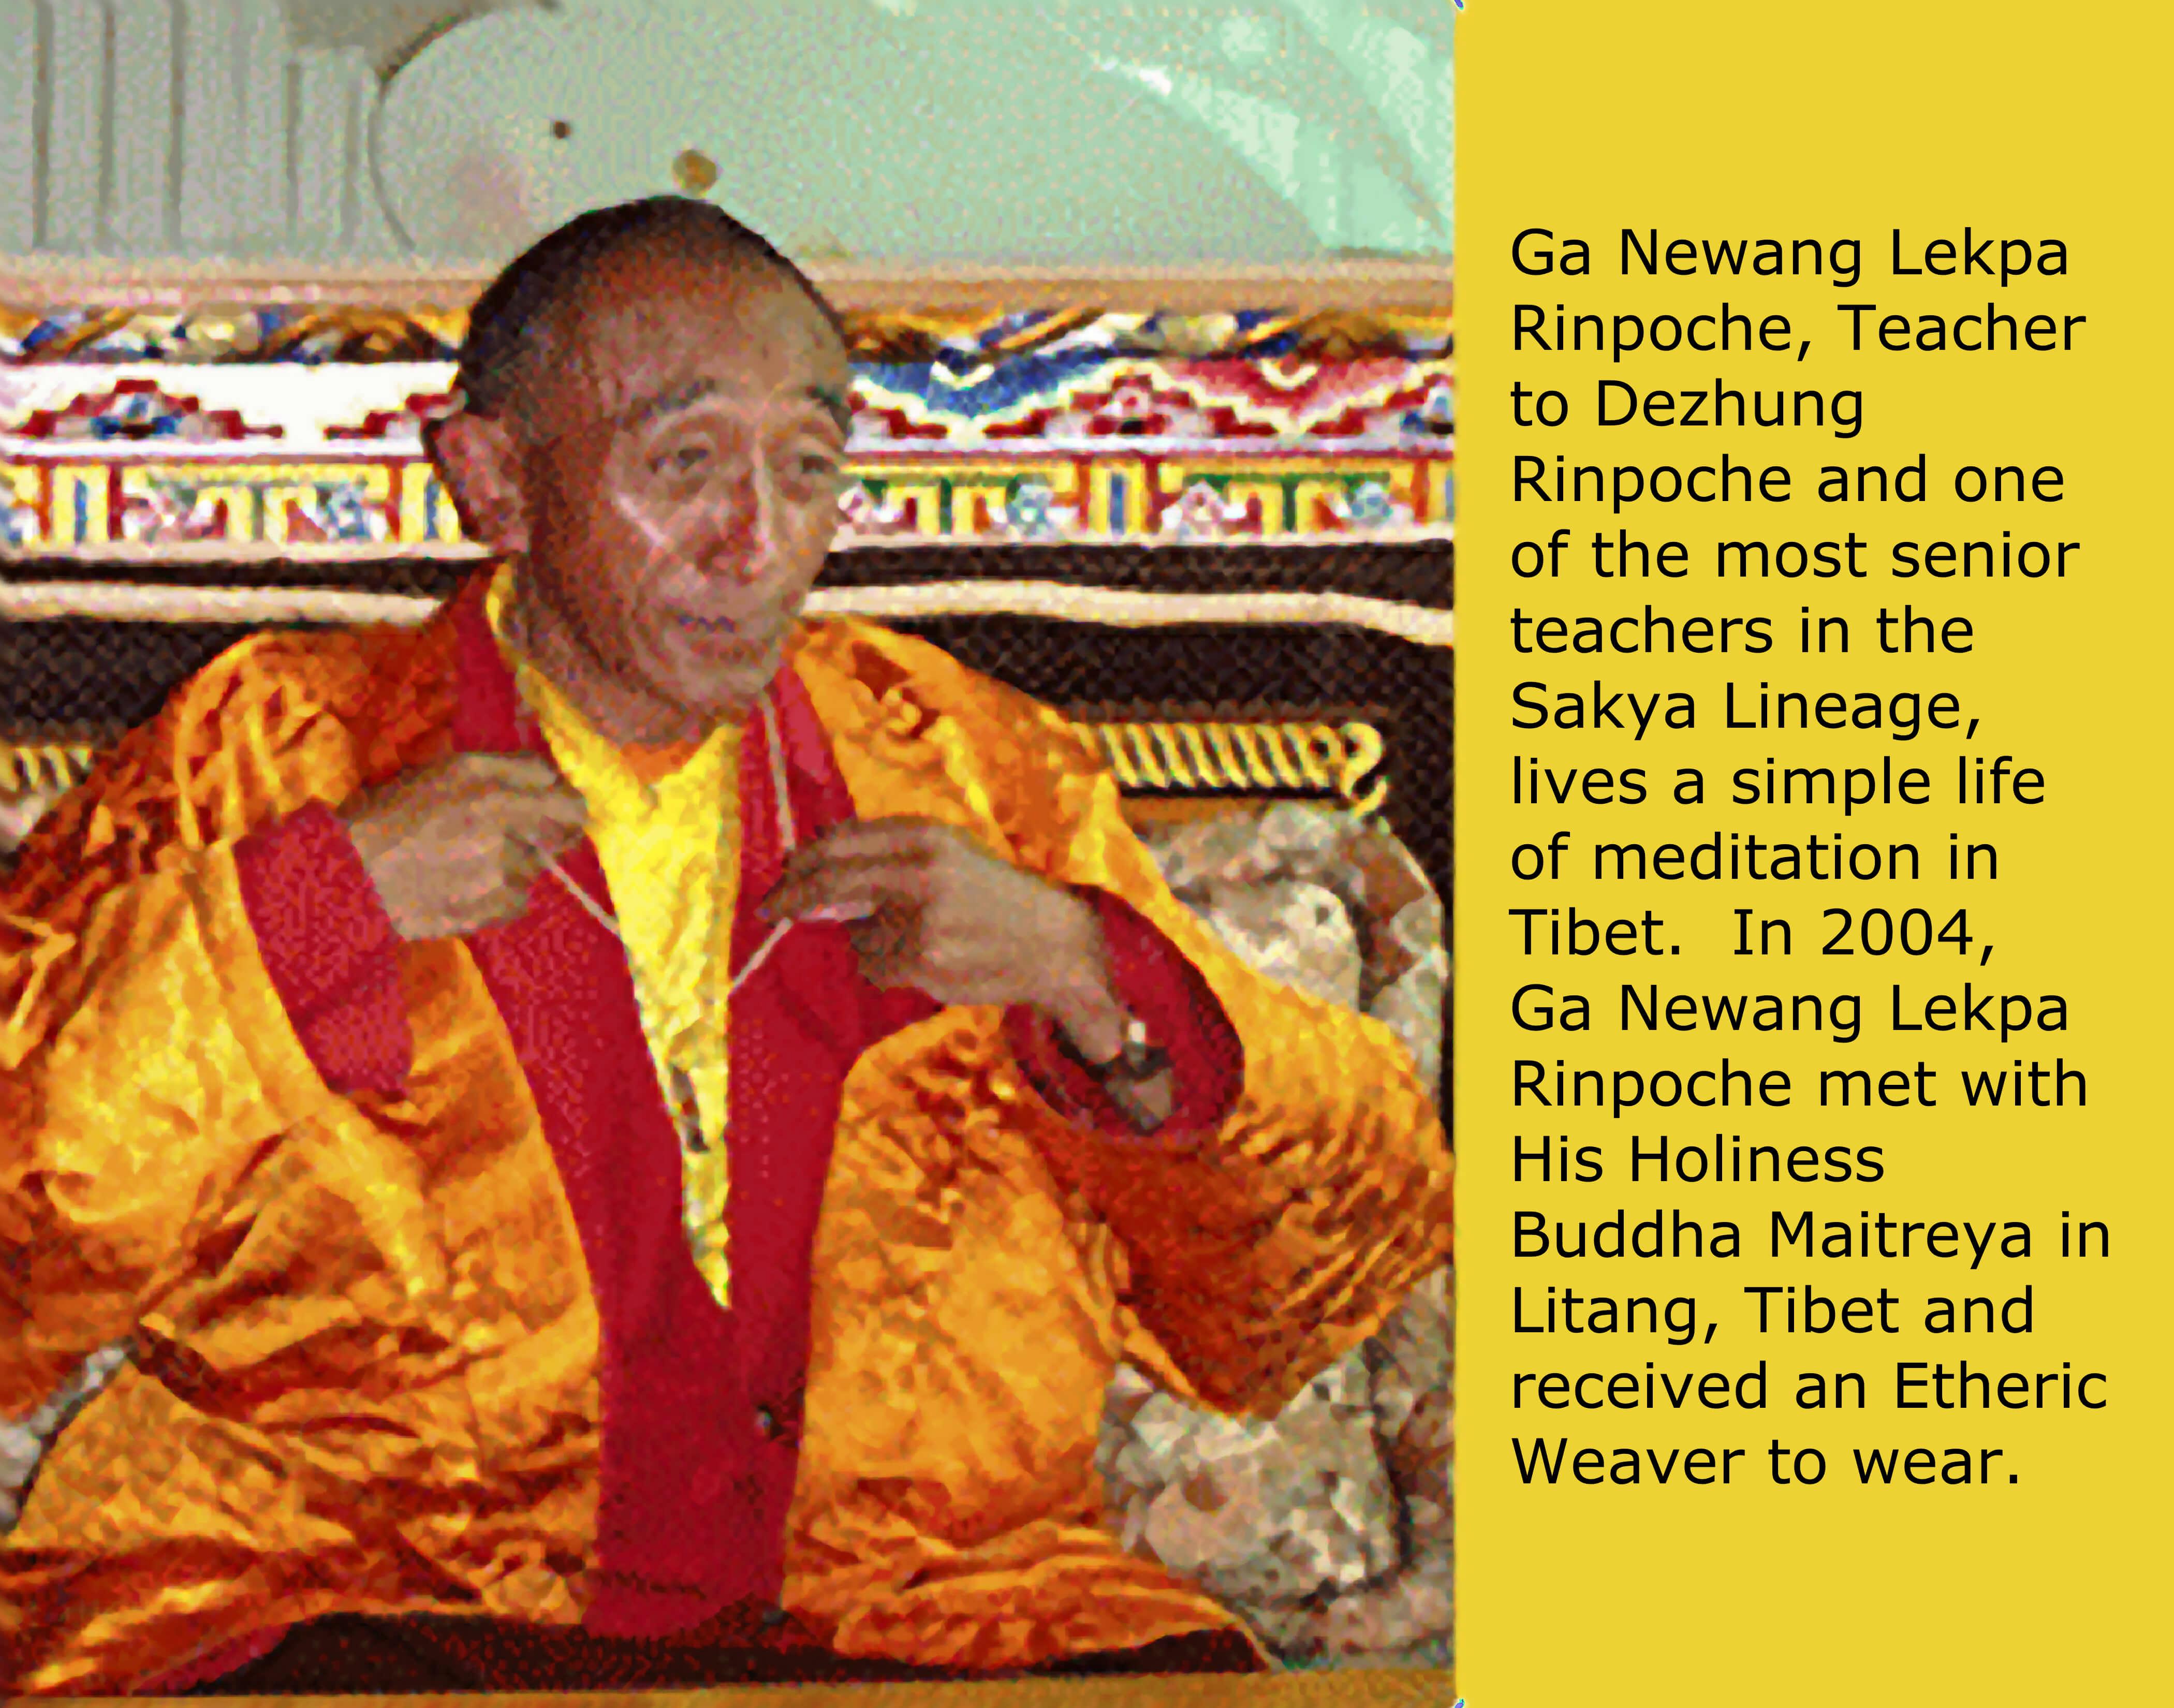 Buddha Maitreya met Ga Newang Lekpa